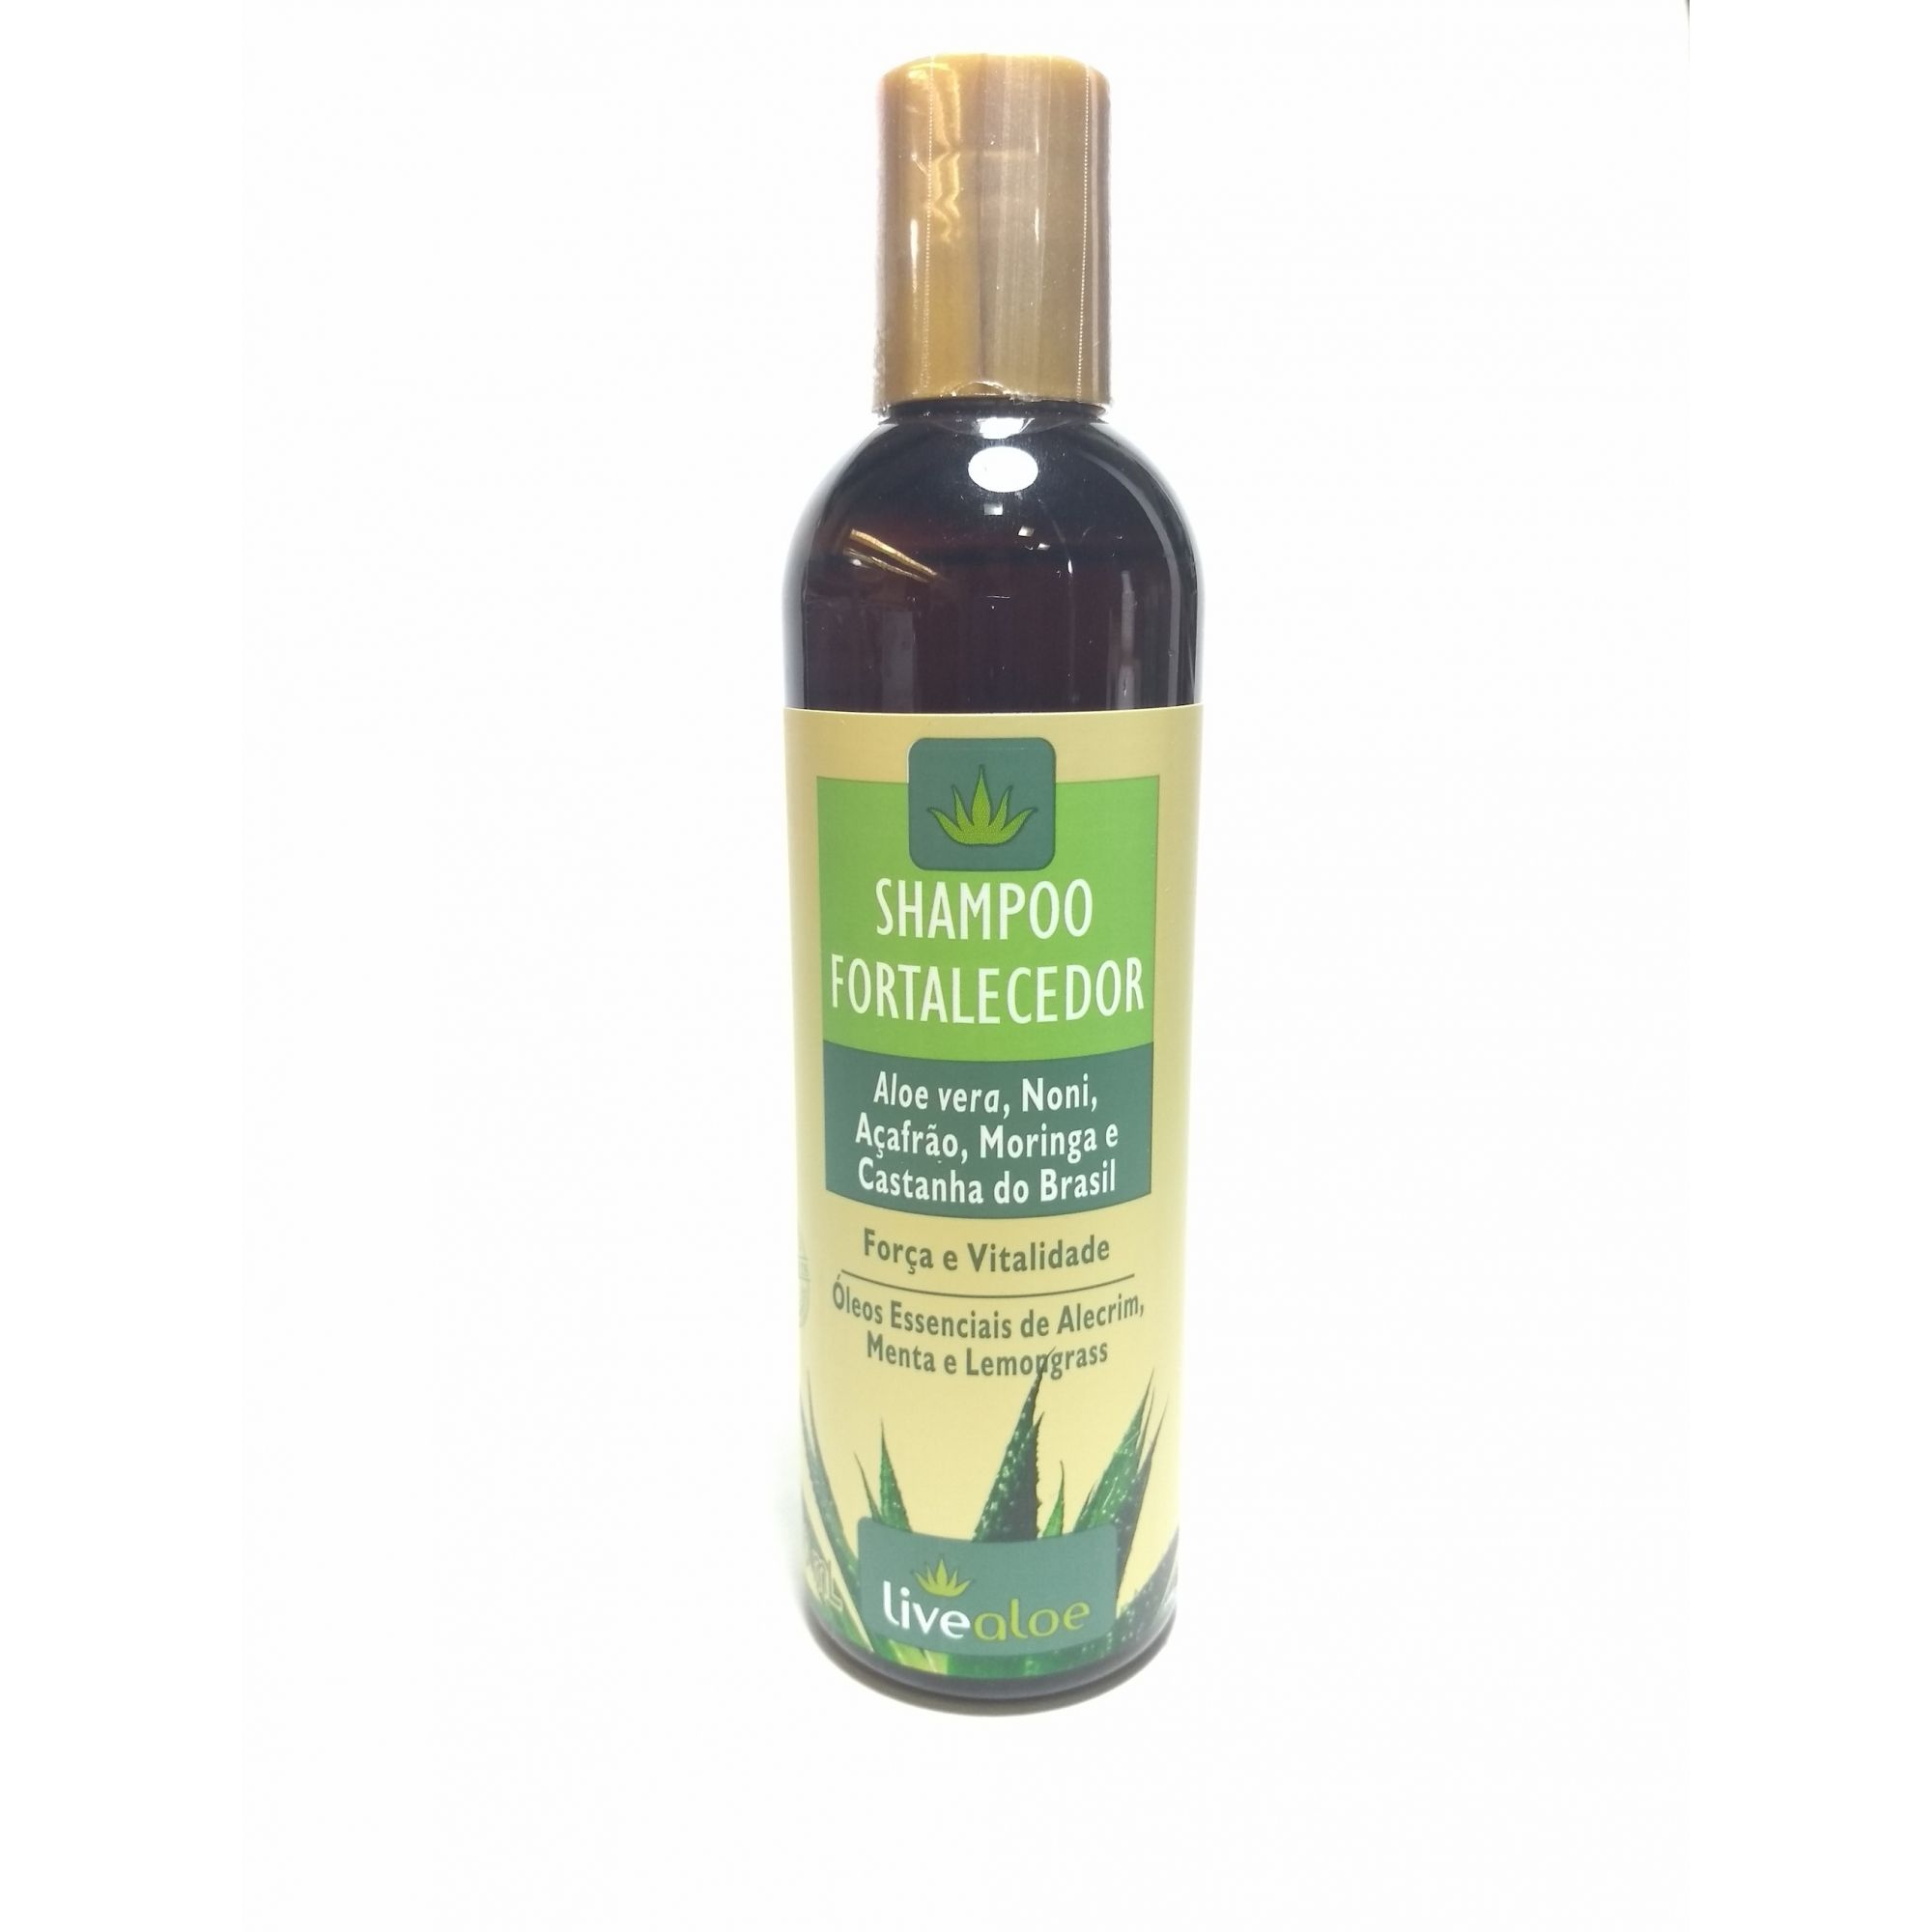 Shampoo fortalecedor, 240ml – Live Aloe